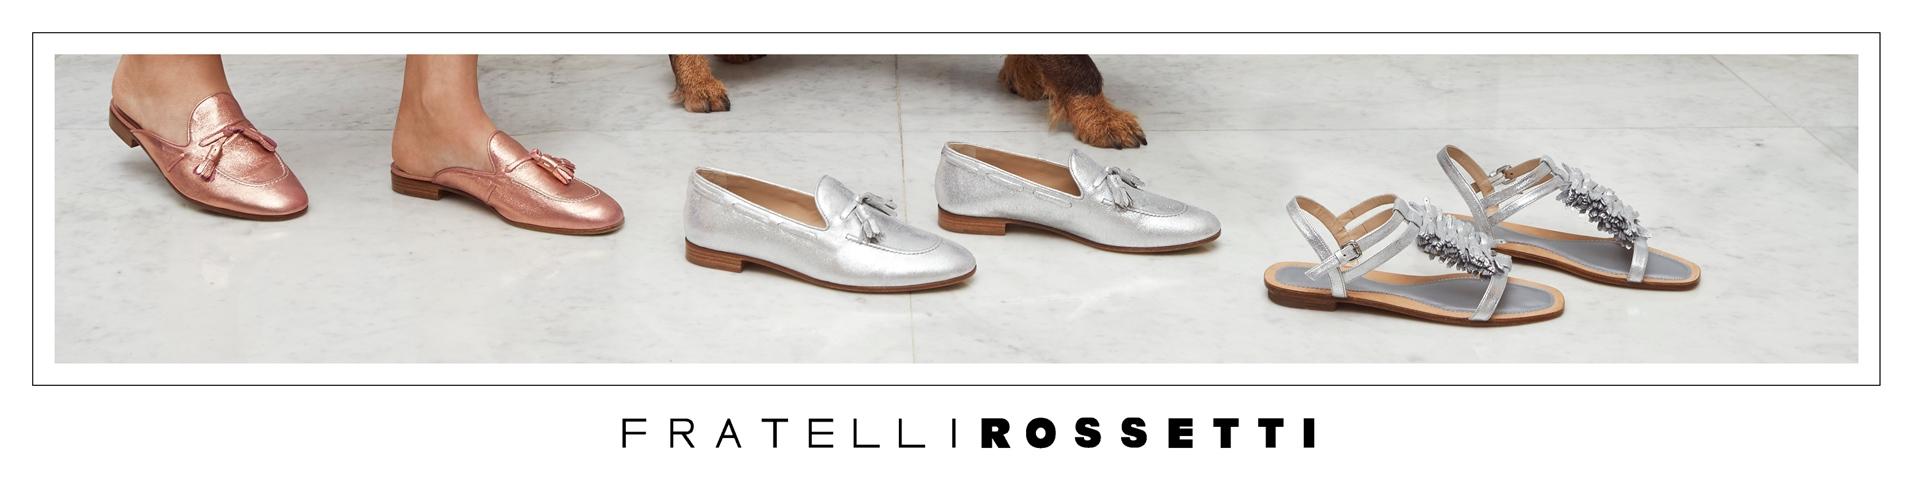 Fratelli Rossetti Online Shop   Fratelli Rossetti online bestellen ...